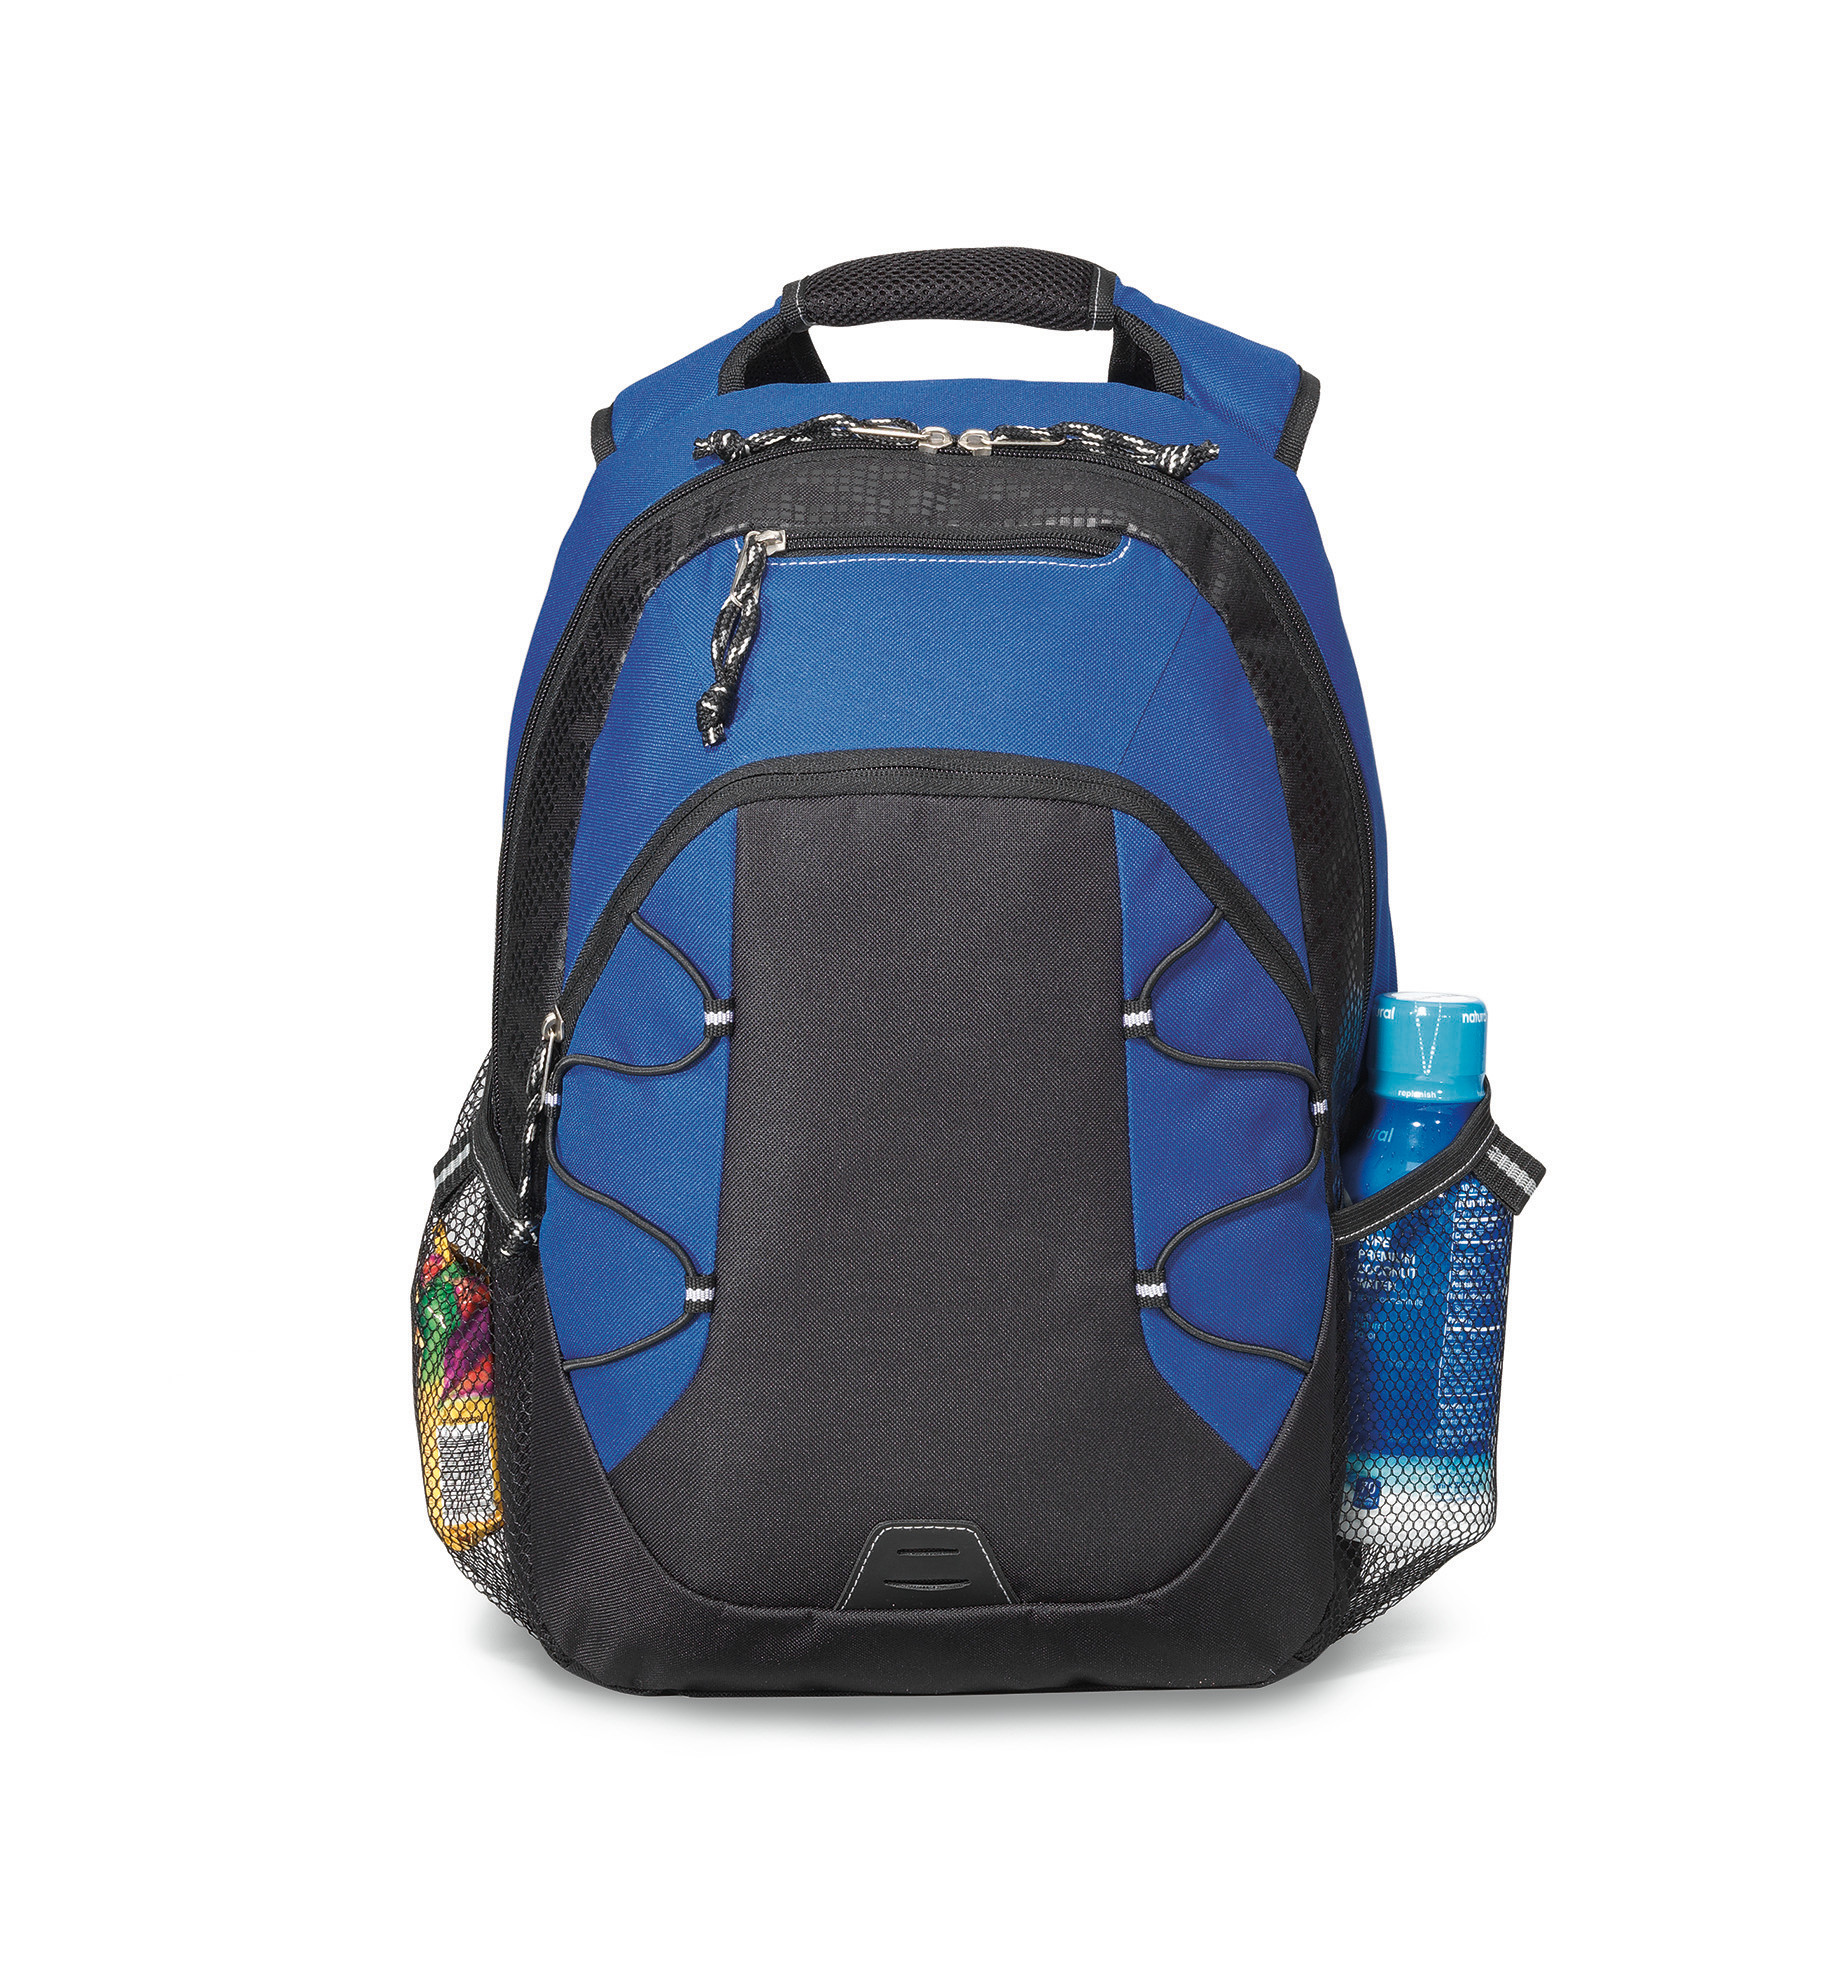 Gemline 5195 - Matrix Computer Backpack